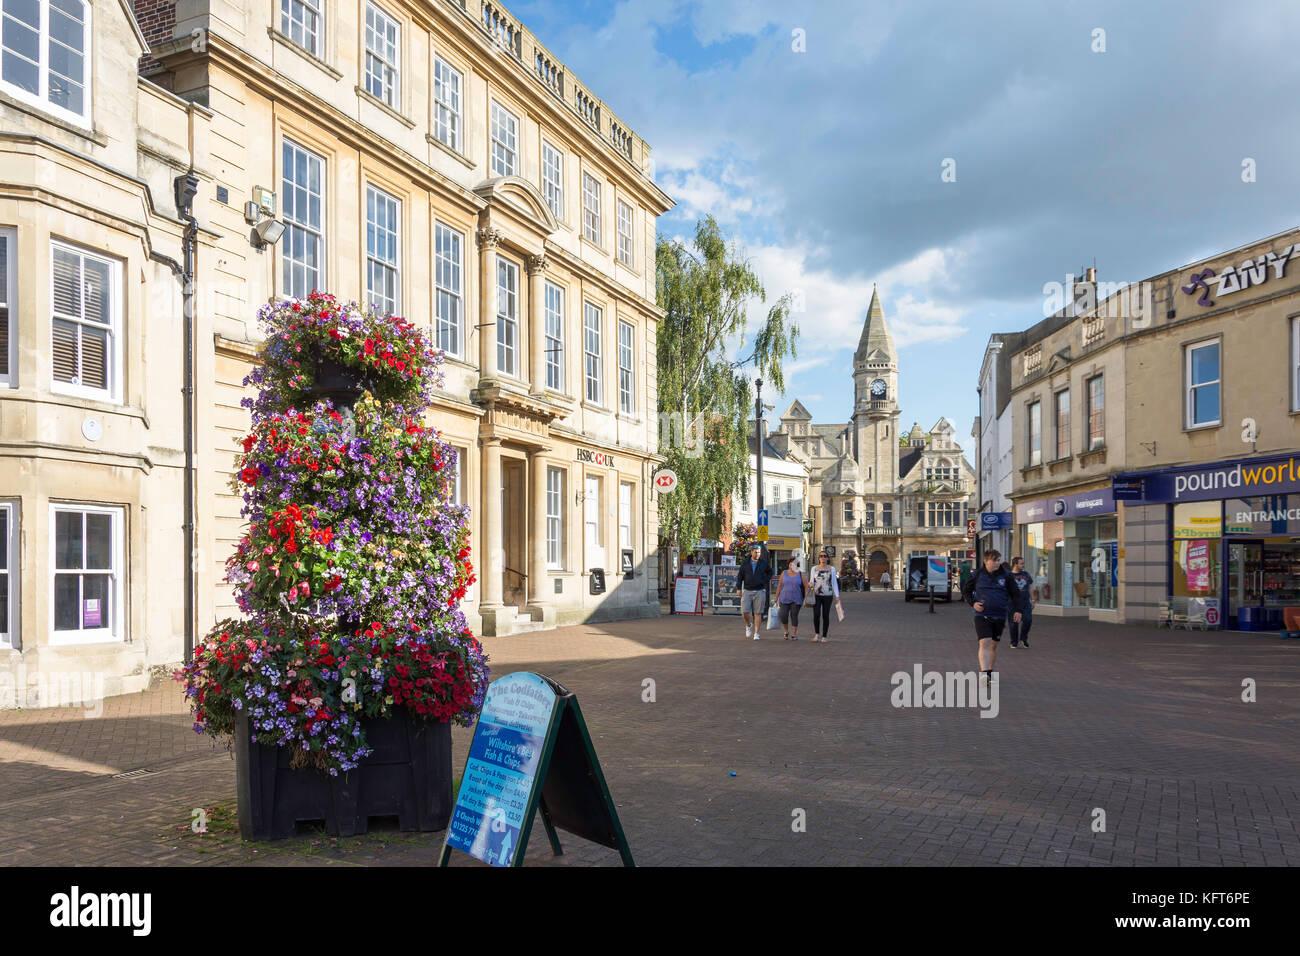 Fore Street, Trowbridge, Wiltshire, England, United Kingdom - Stock Image